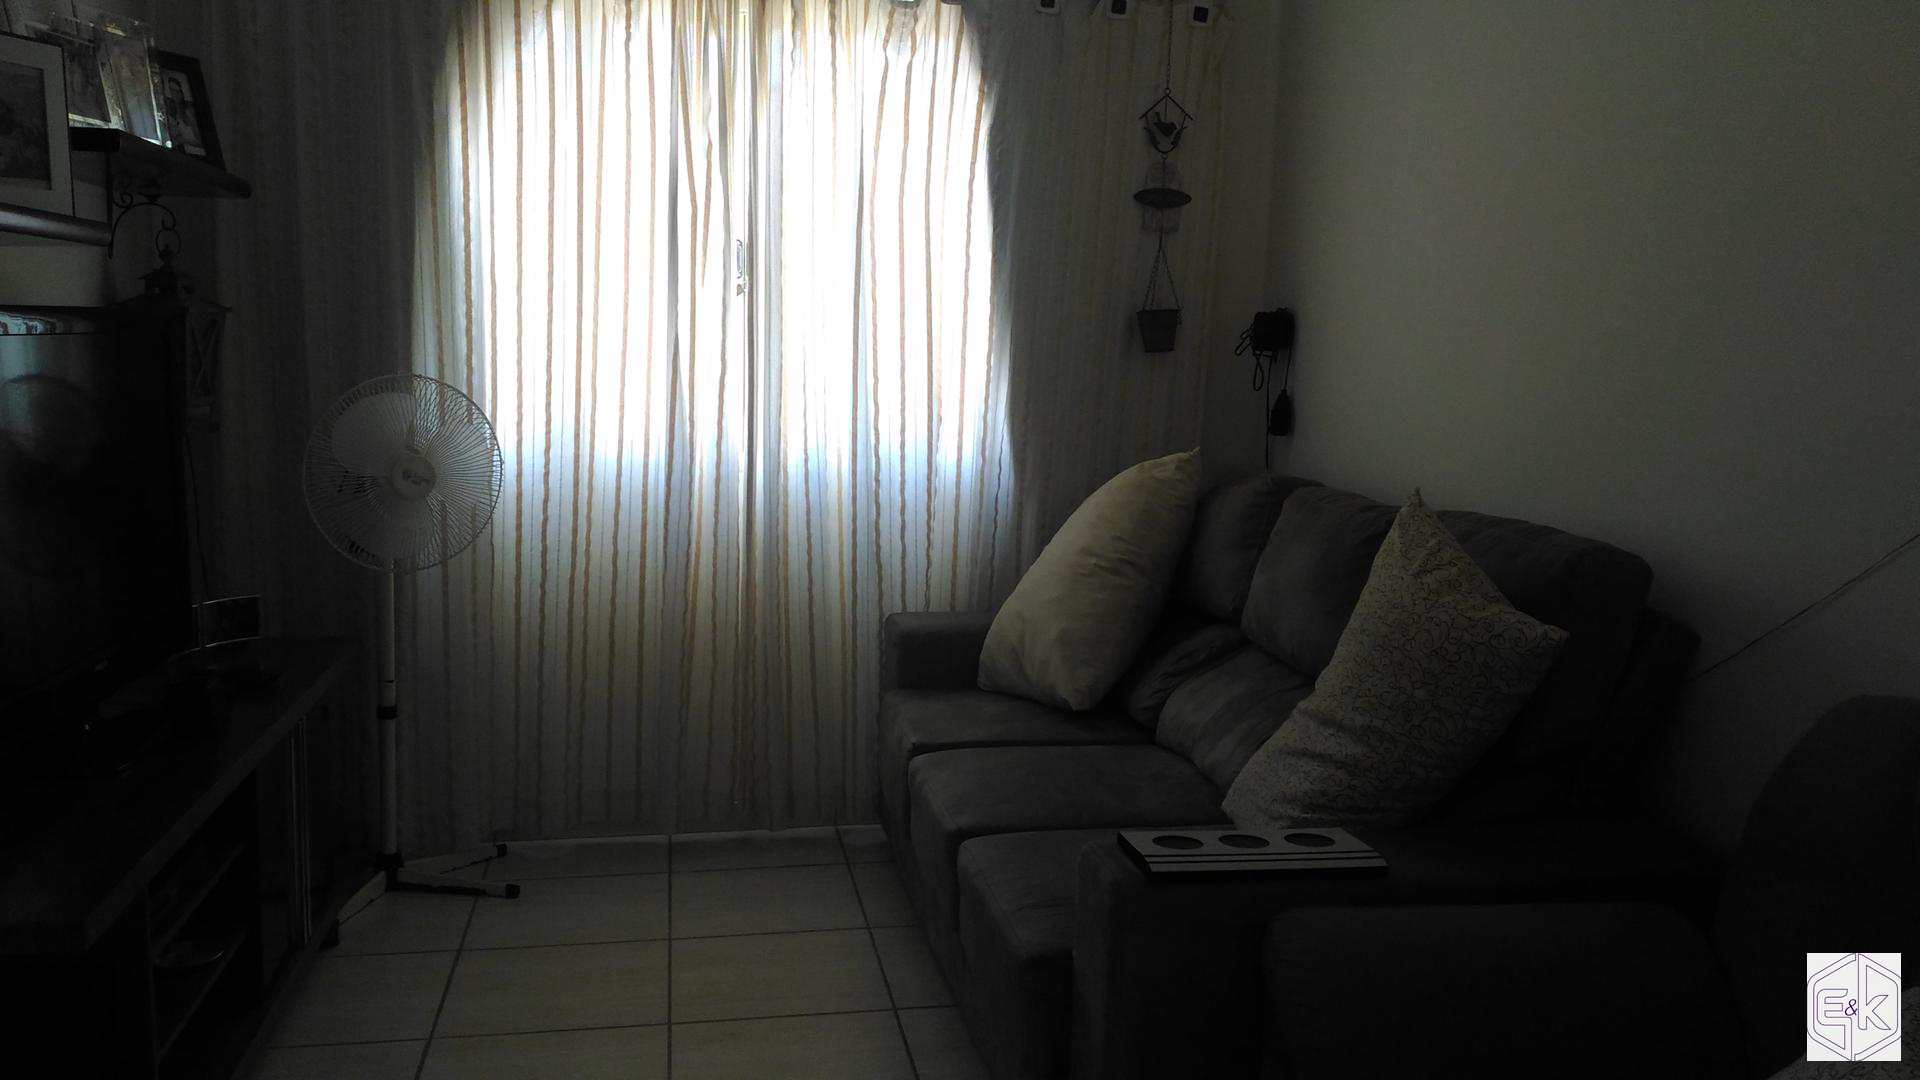 Apartamento com 2 dorms, Fernandes, Santa Rita do Sapucaí - R$ 160 mil, Cod: 208